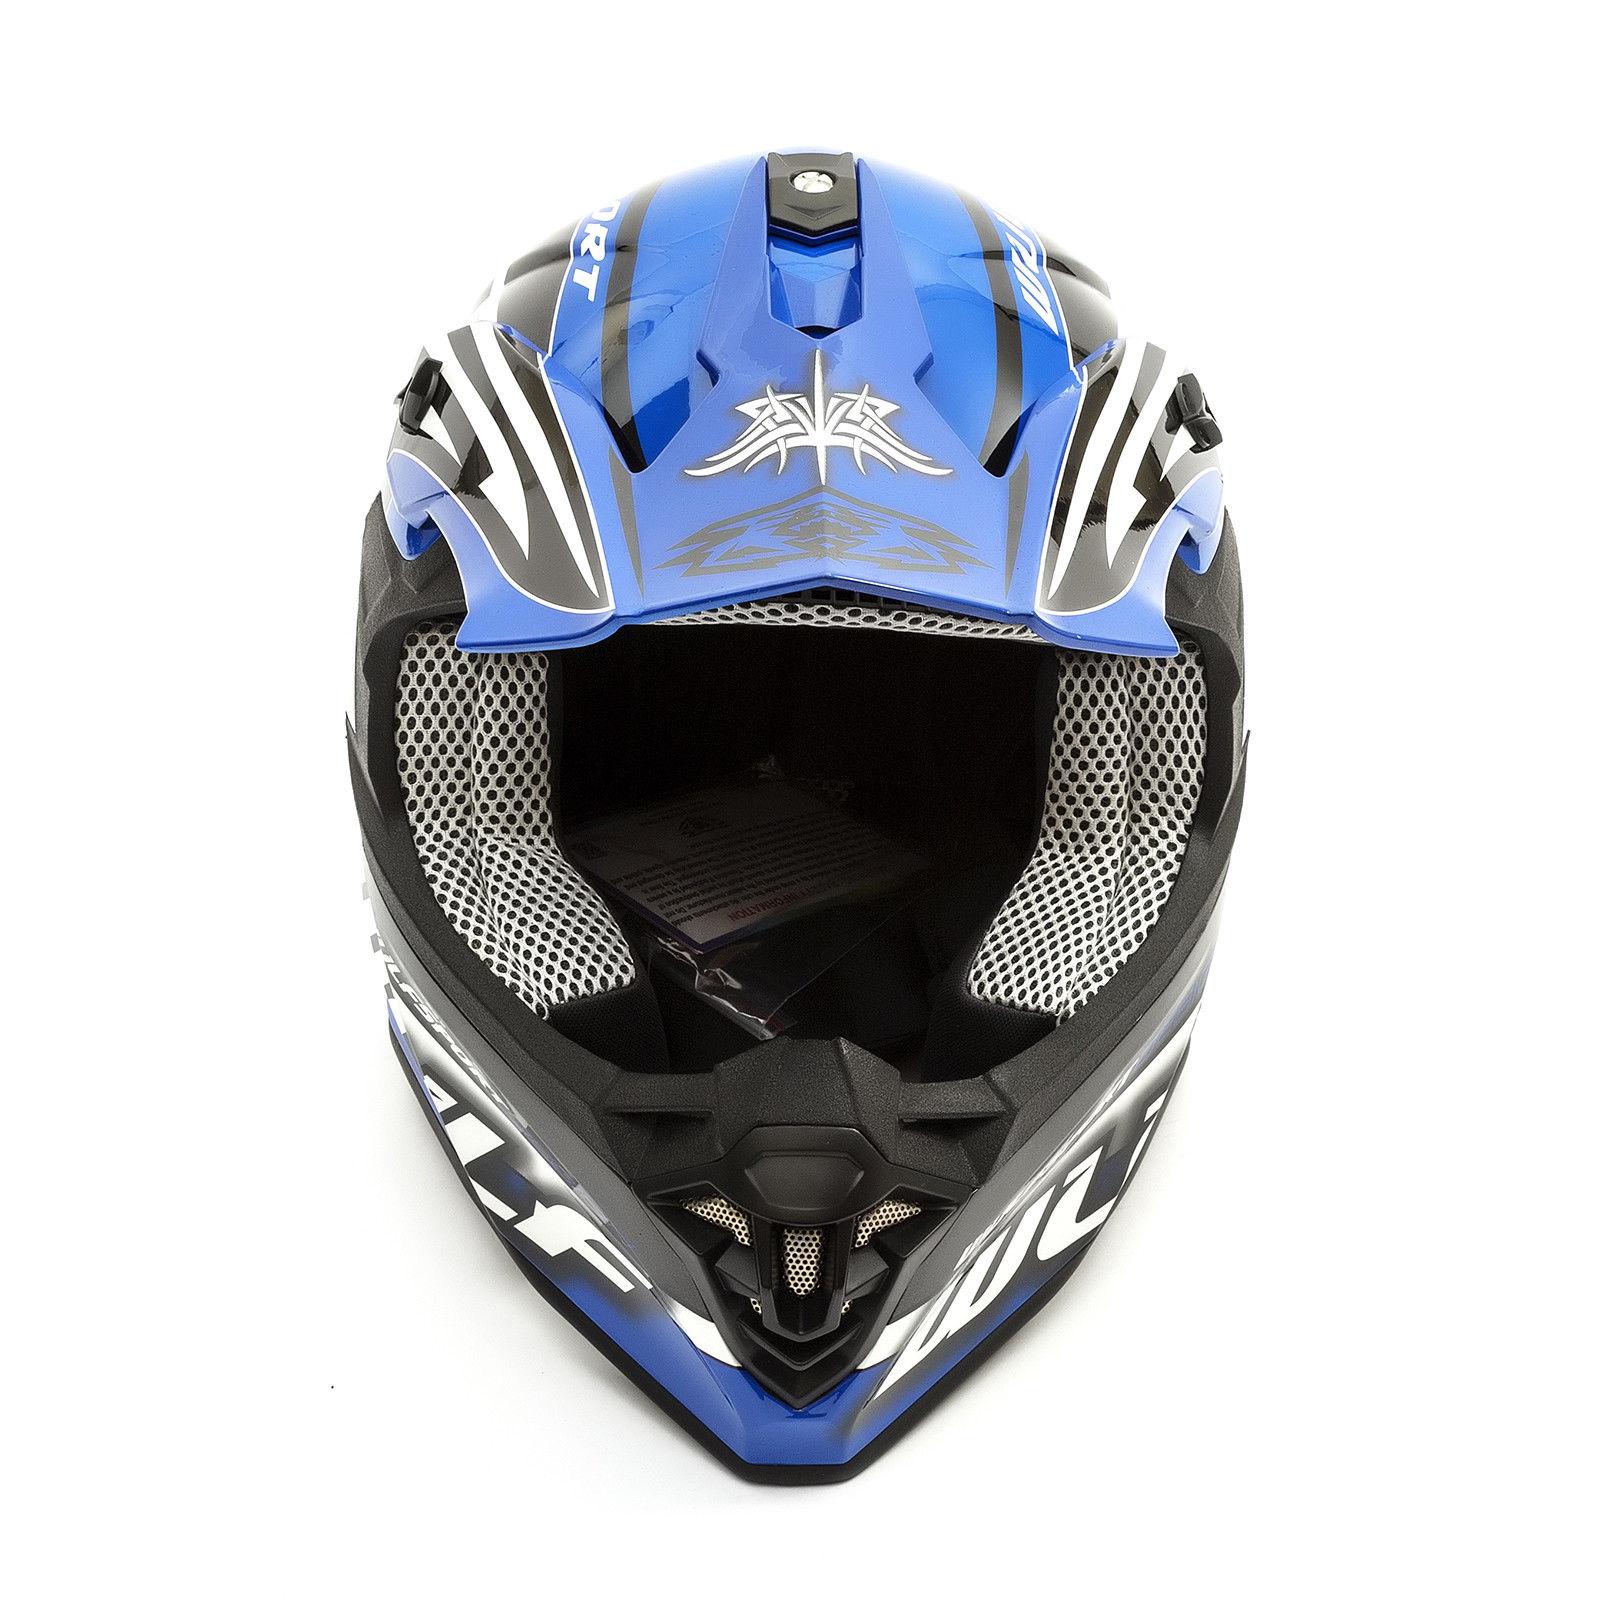 Wulfsport-Adult-Sceptre-Helmets-Motocross-Pitbike-Motorbike-Off-Road-Racing-ATV thumbnail 22